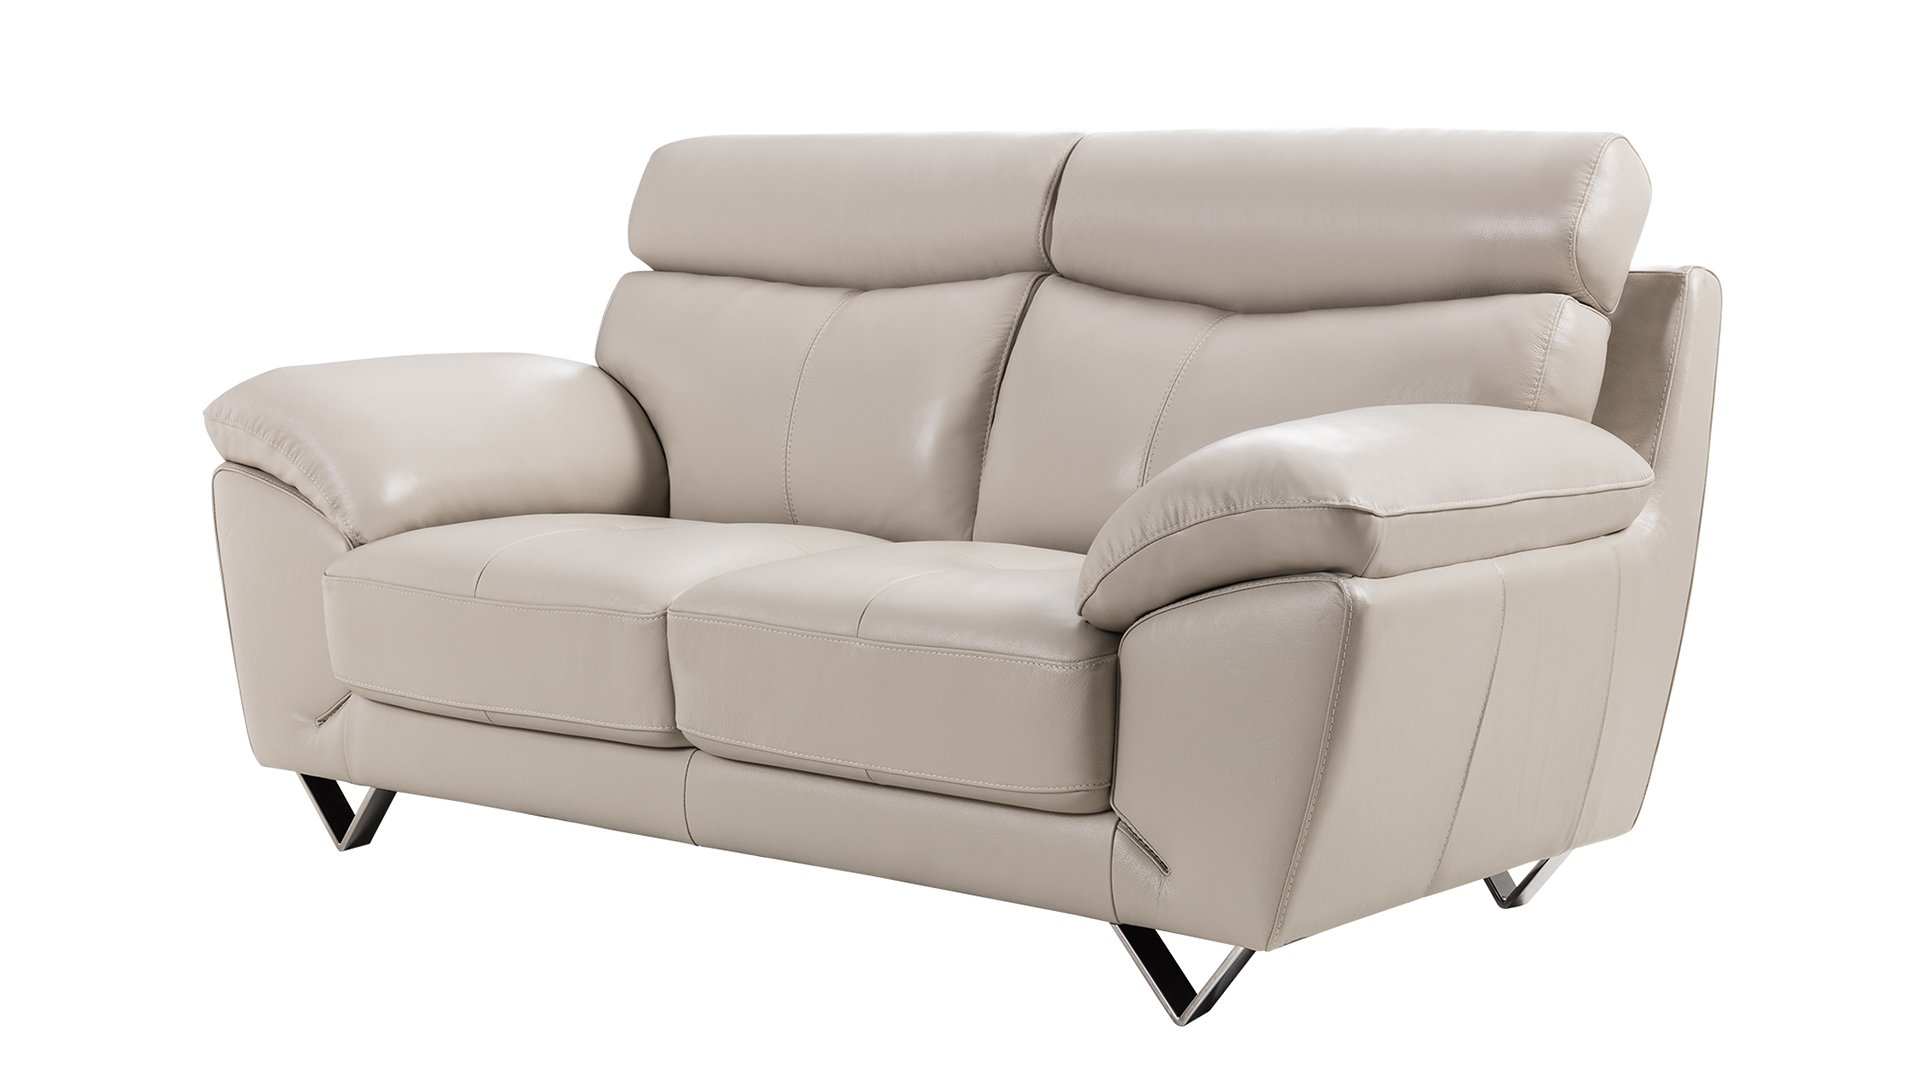 Pleasing American Eagle Furniture 2 Piece Valencia Collection Complete Italian Grain Leather Living Room Sofa Set Light Gray Ibusinesslaw Wood Chair Design Ideas Ibusinesslaworg